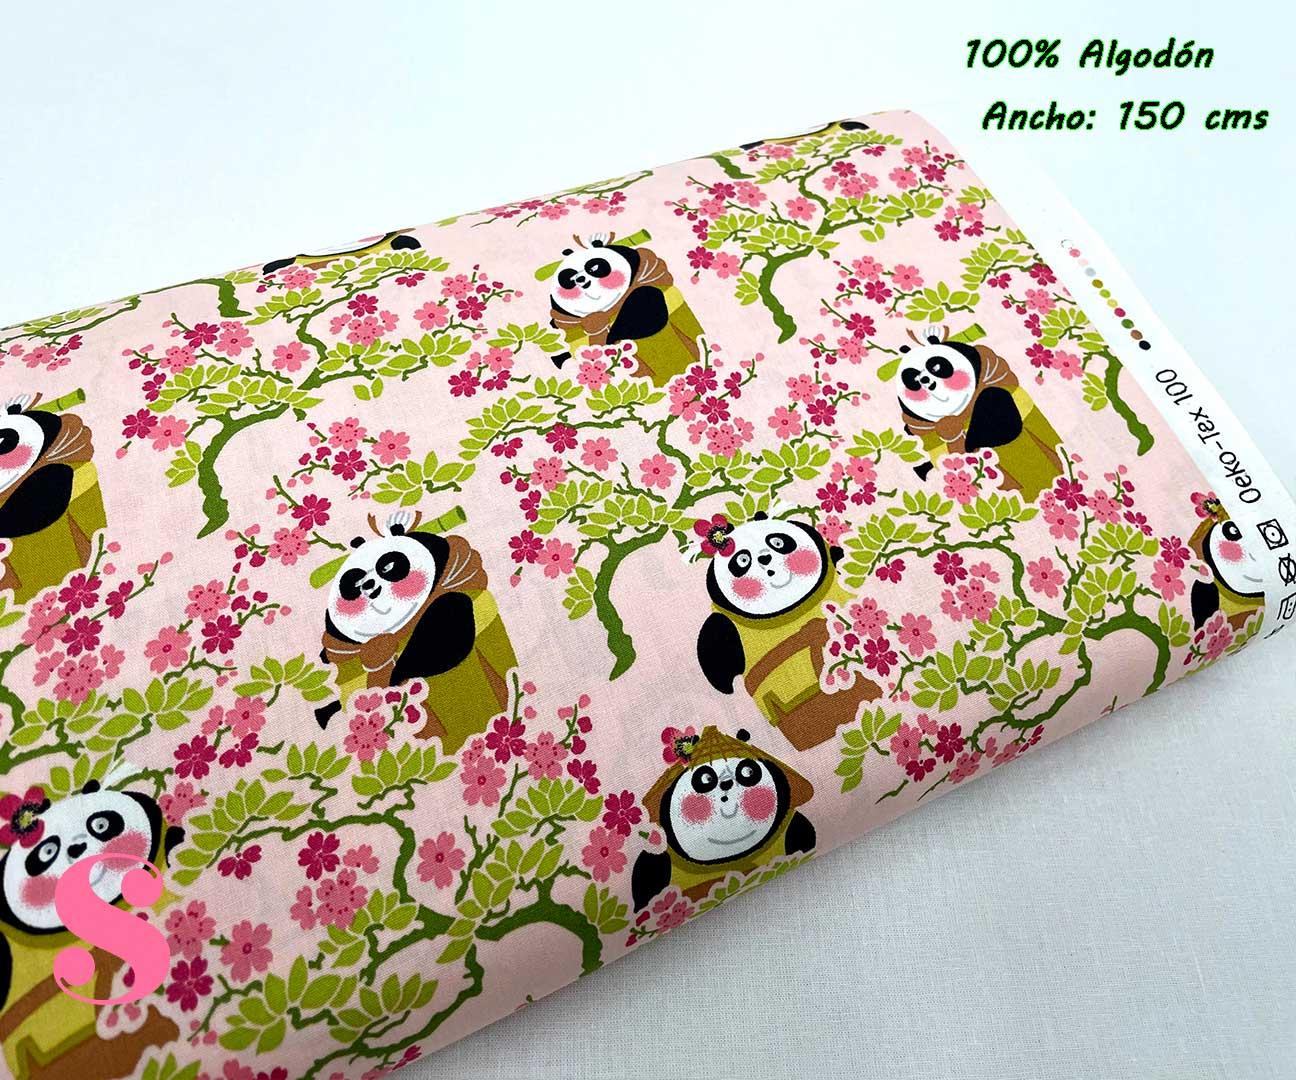 36-tela-estampada-kung-fu-panda,telas-dibujos-animados-frikis,telas-infantiles,tejidos-infantiles,Tejido Estampado Kung Fu Panda Sakura